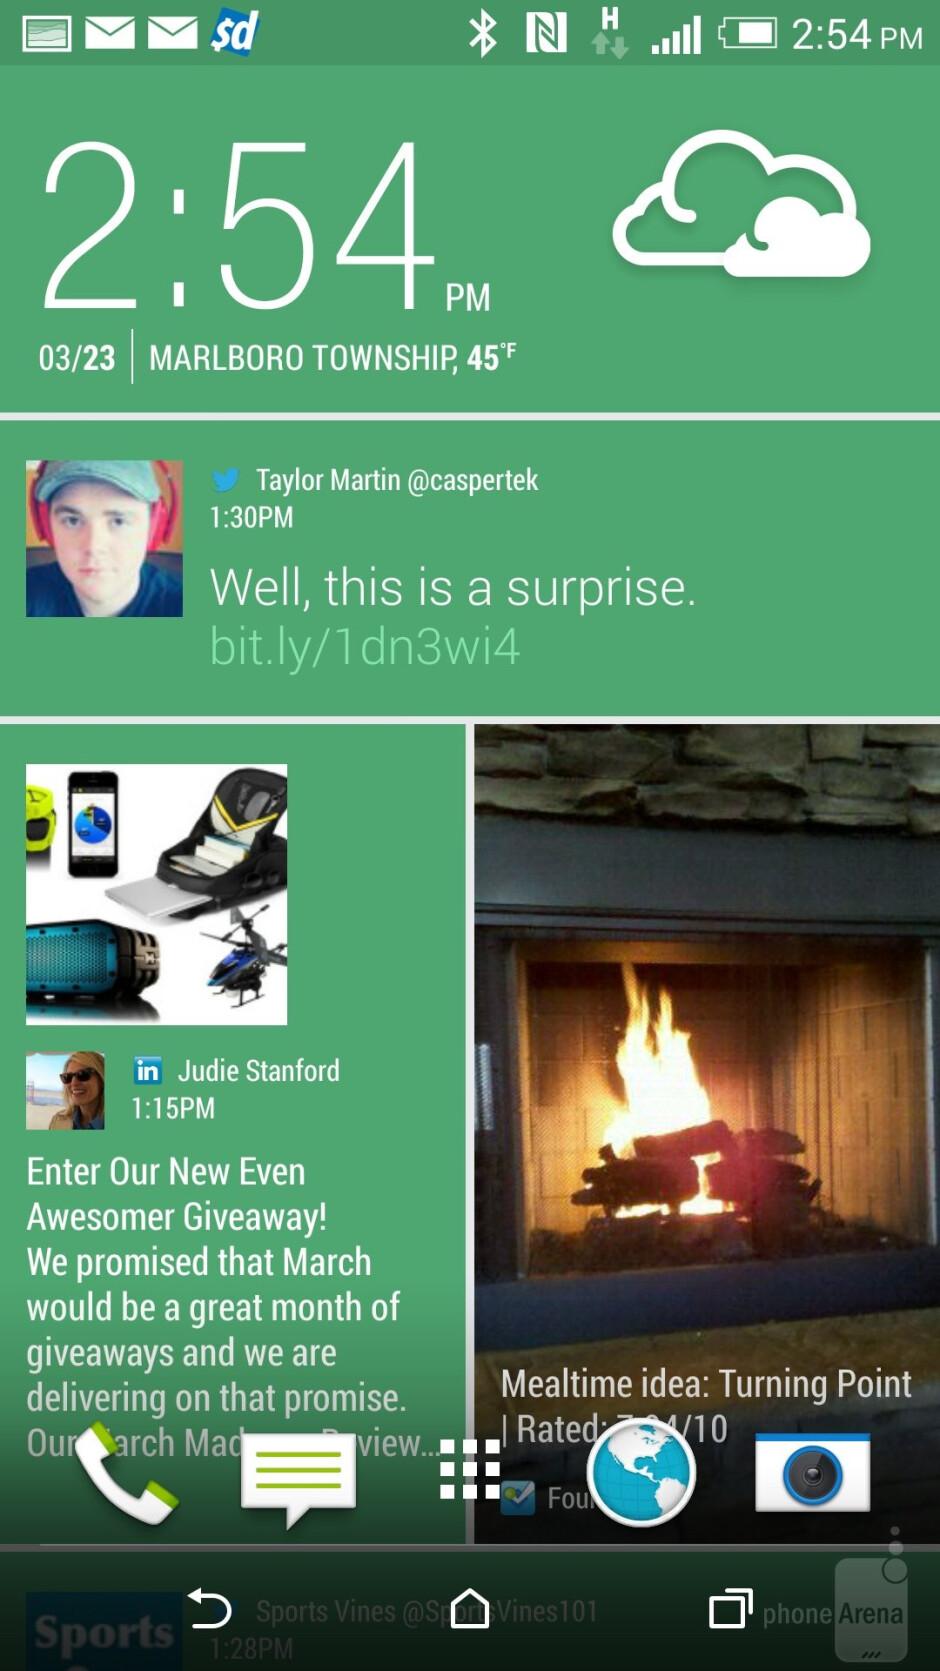 HTC One (M8) user interface - Samsung Galaxy Note 4 vs HTC One (M8)